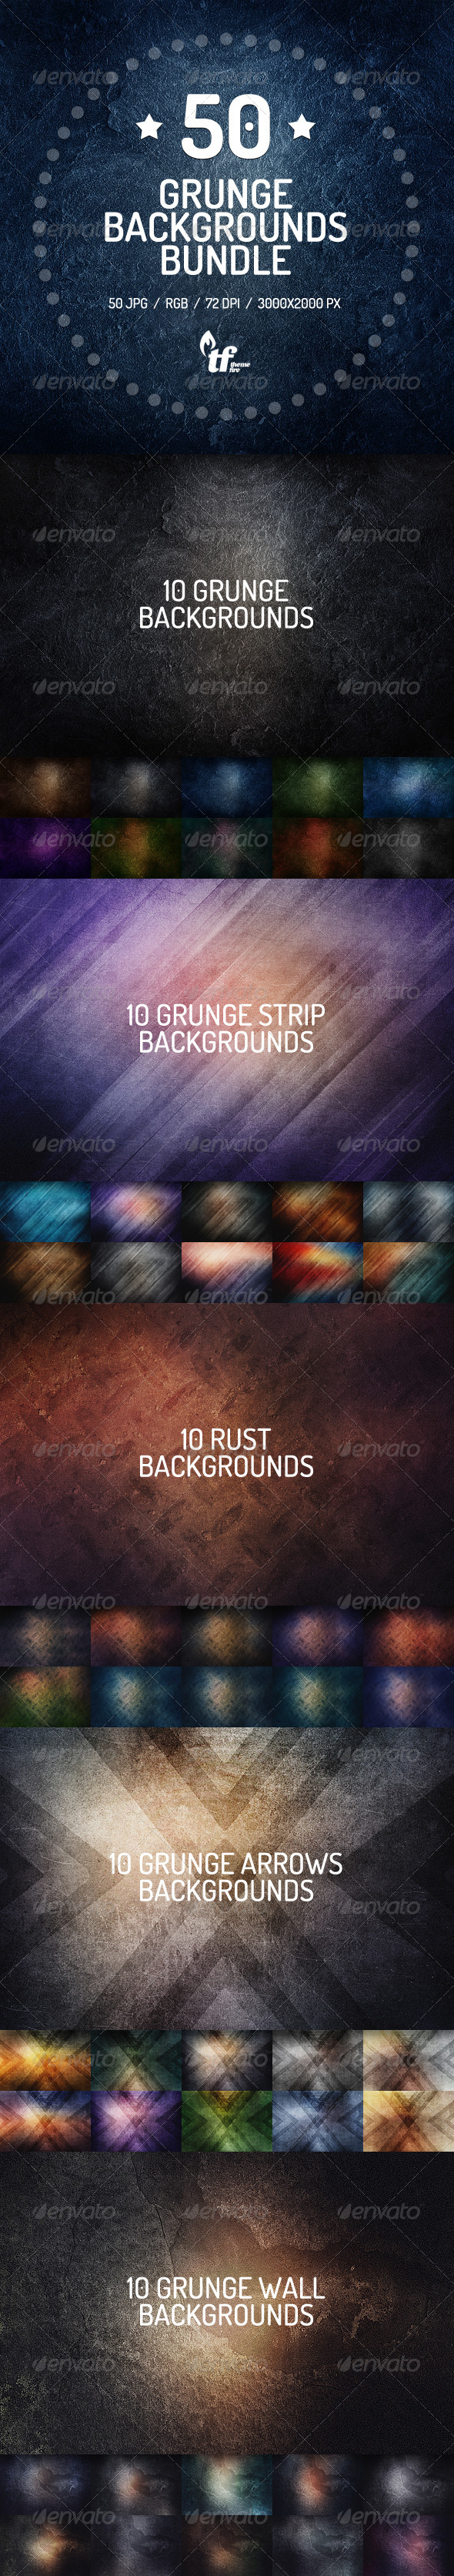 GraphicRiver 50 Grunge Backgrounds Bundle 7940196